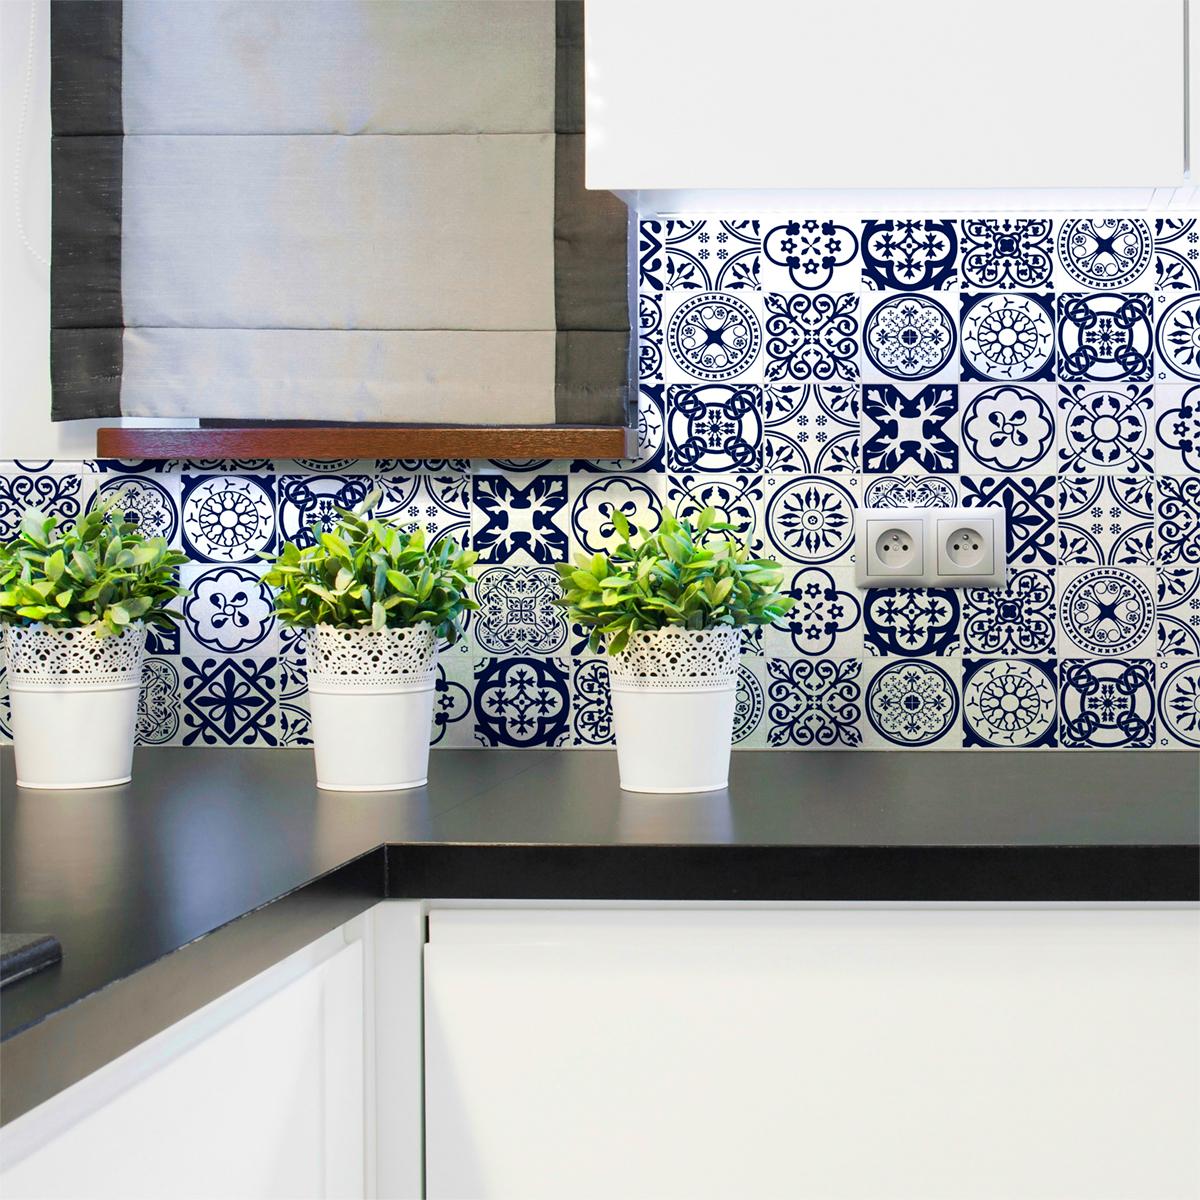 16 stickers carrelages azulejos ornements florales bleu art et design artistiques ambiance. Black Bedroom Furniture Sets. Home Design Ideas